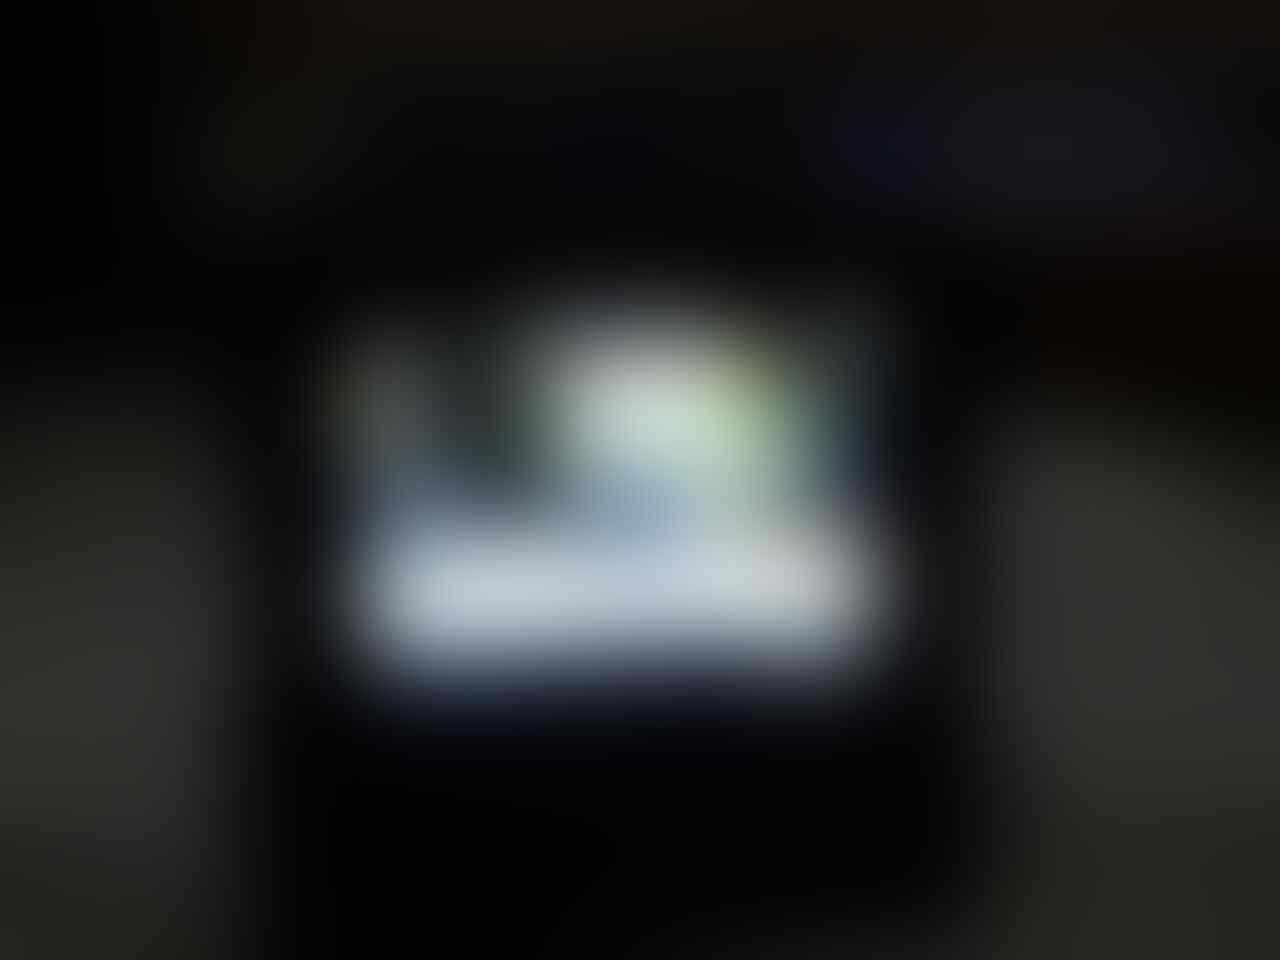 GoPro Hero3+ Black Edition dan LCD touch bacpac